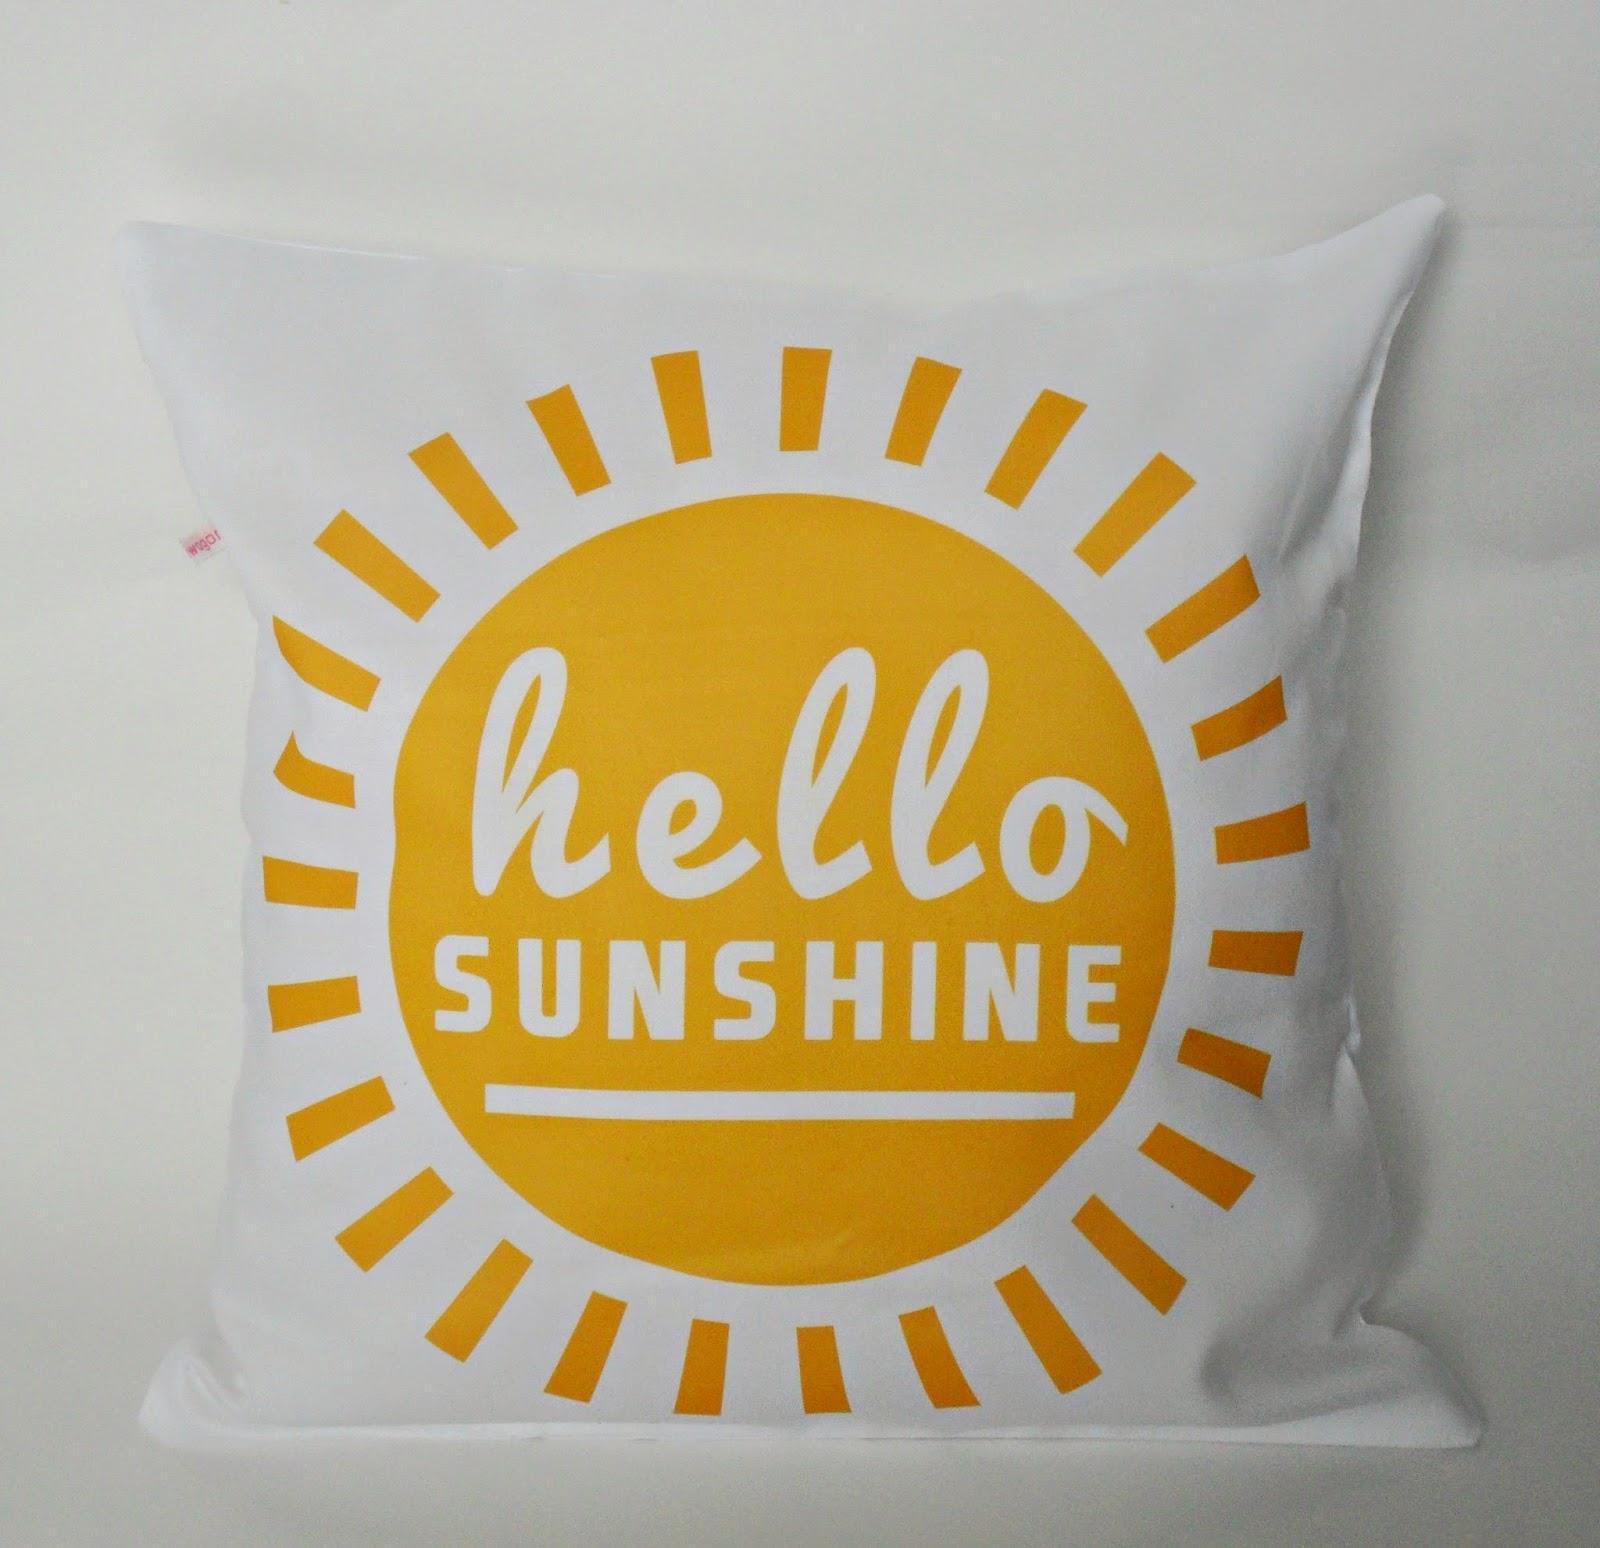 hello sunshine Lyrics to hello sunshine song by aretha franklin: hello sunshine (hello) so glad to see you sunshine hello sunshine (hello) it's been dark for a very.